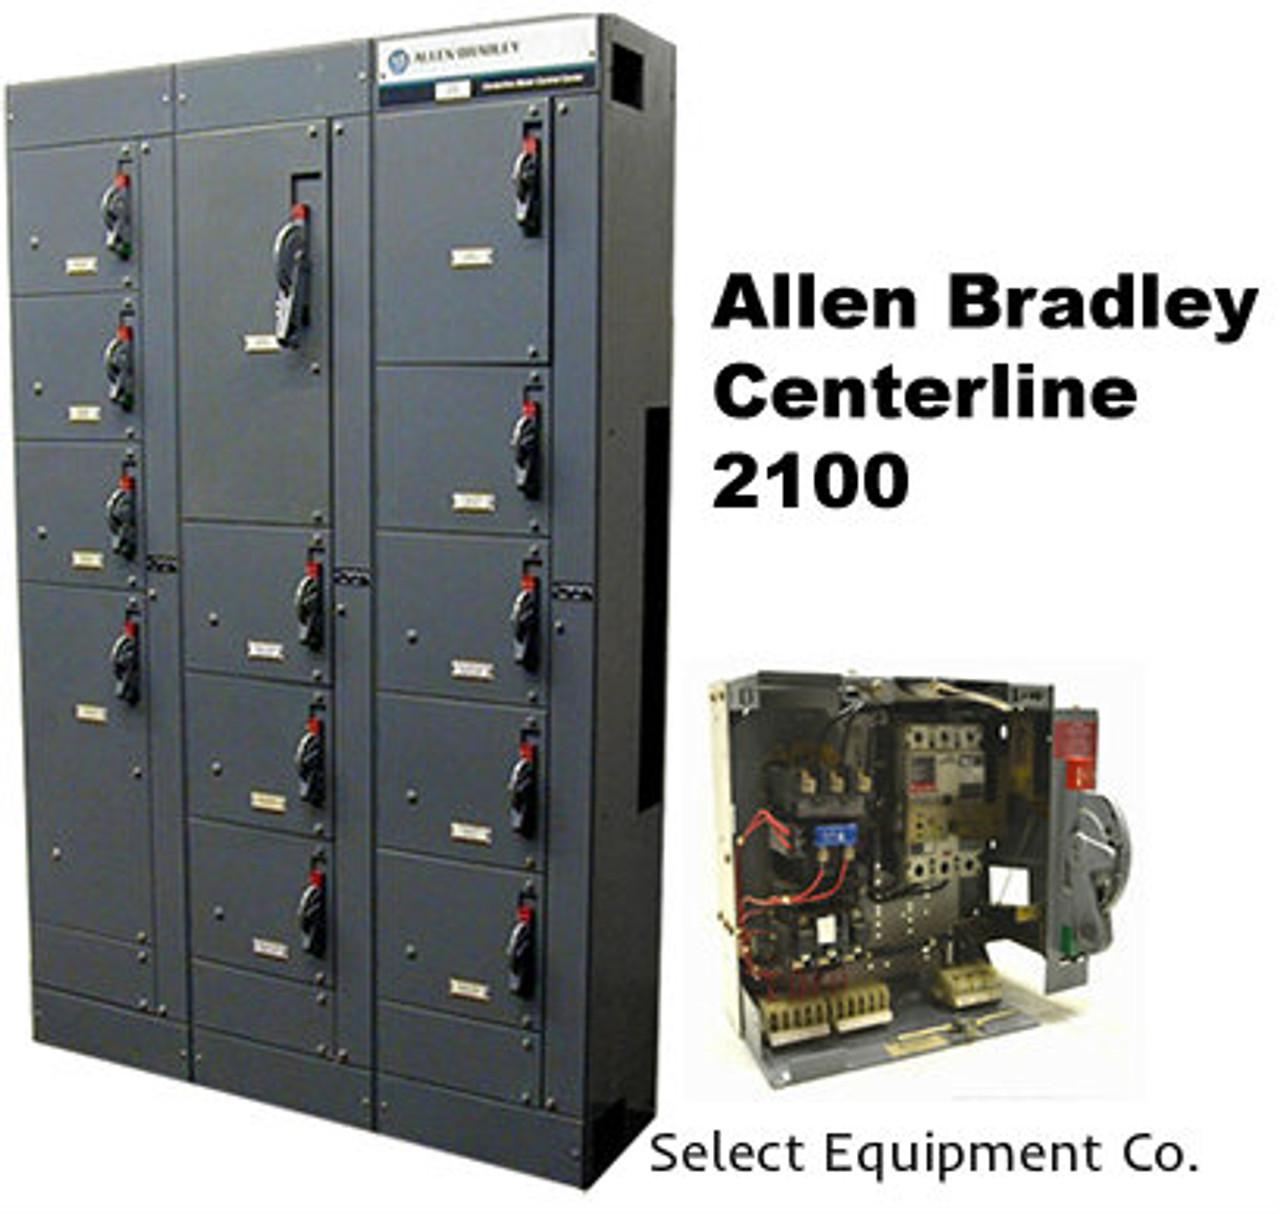 Allen Bradley Centerline 2100 Motor Control Centers & MCC